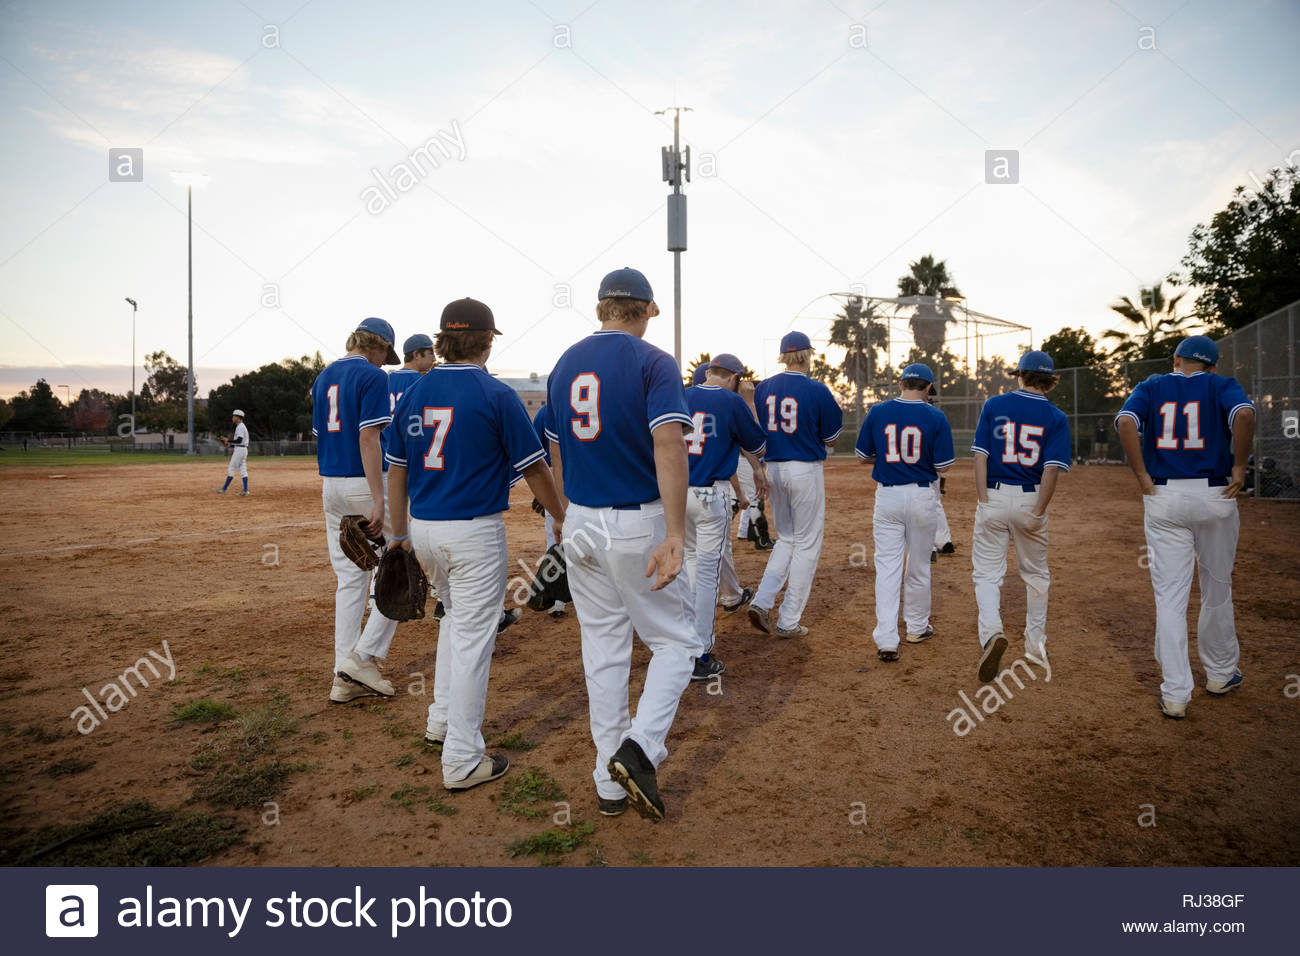 Baseball players walking off field - Stock Image